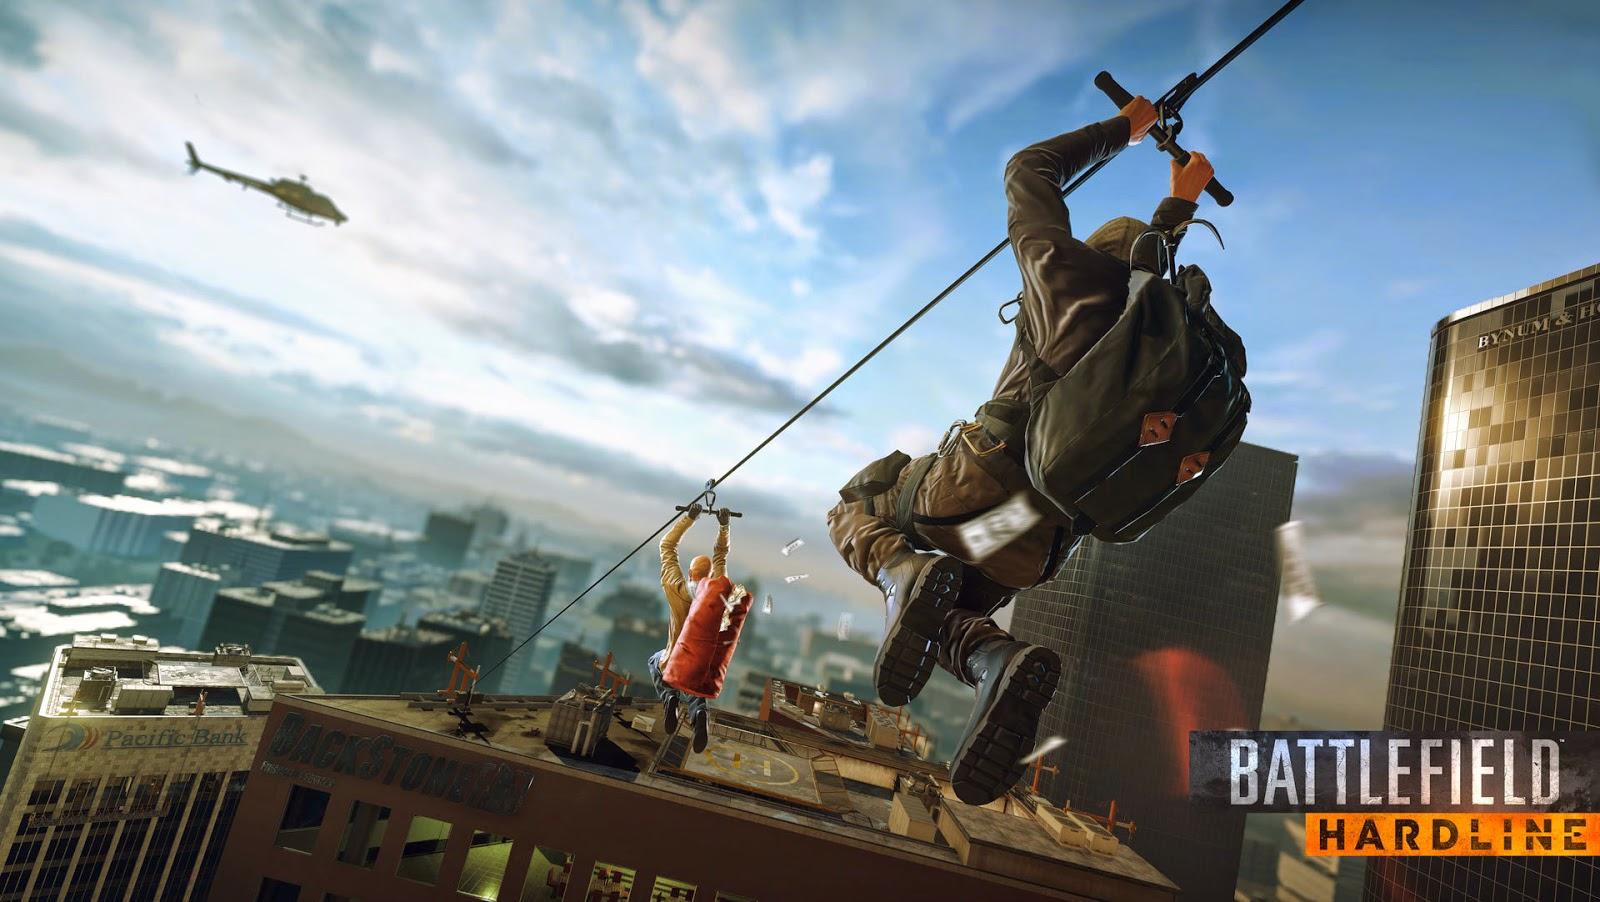 Spesifikasi PC Untuk Battlefield: Hardline